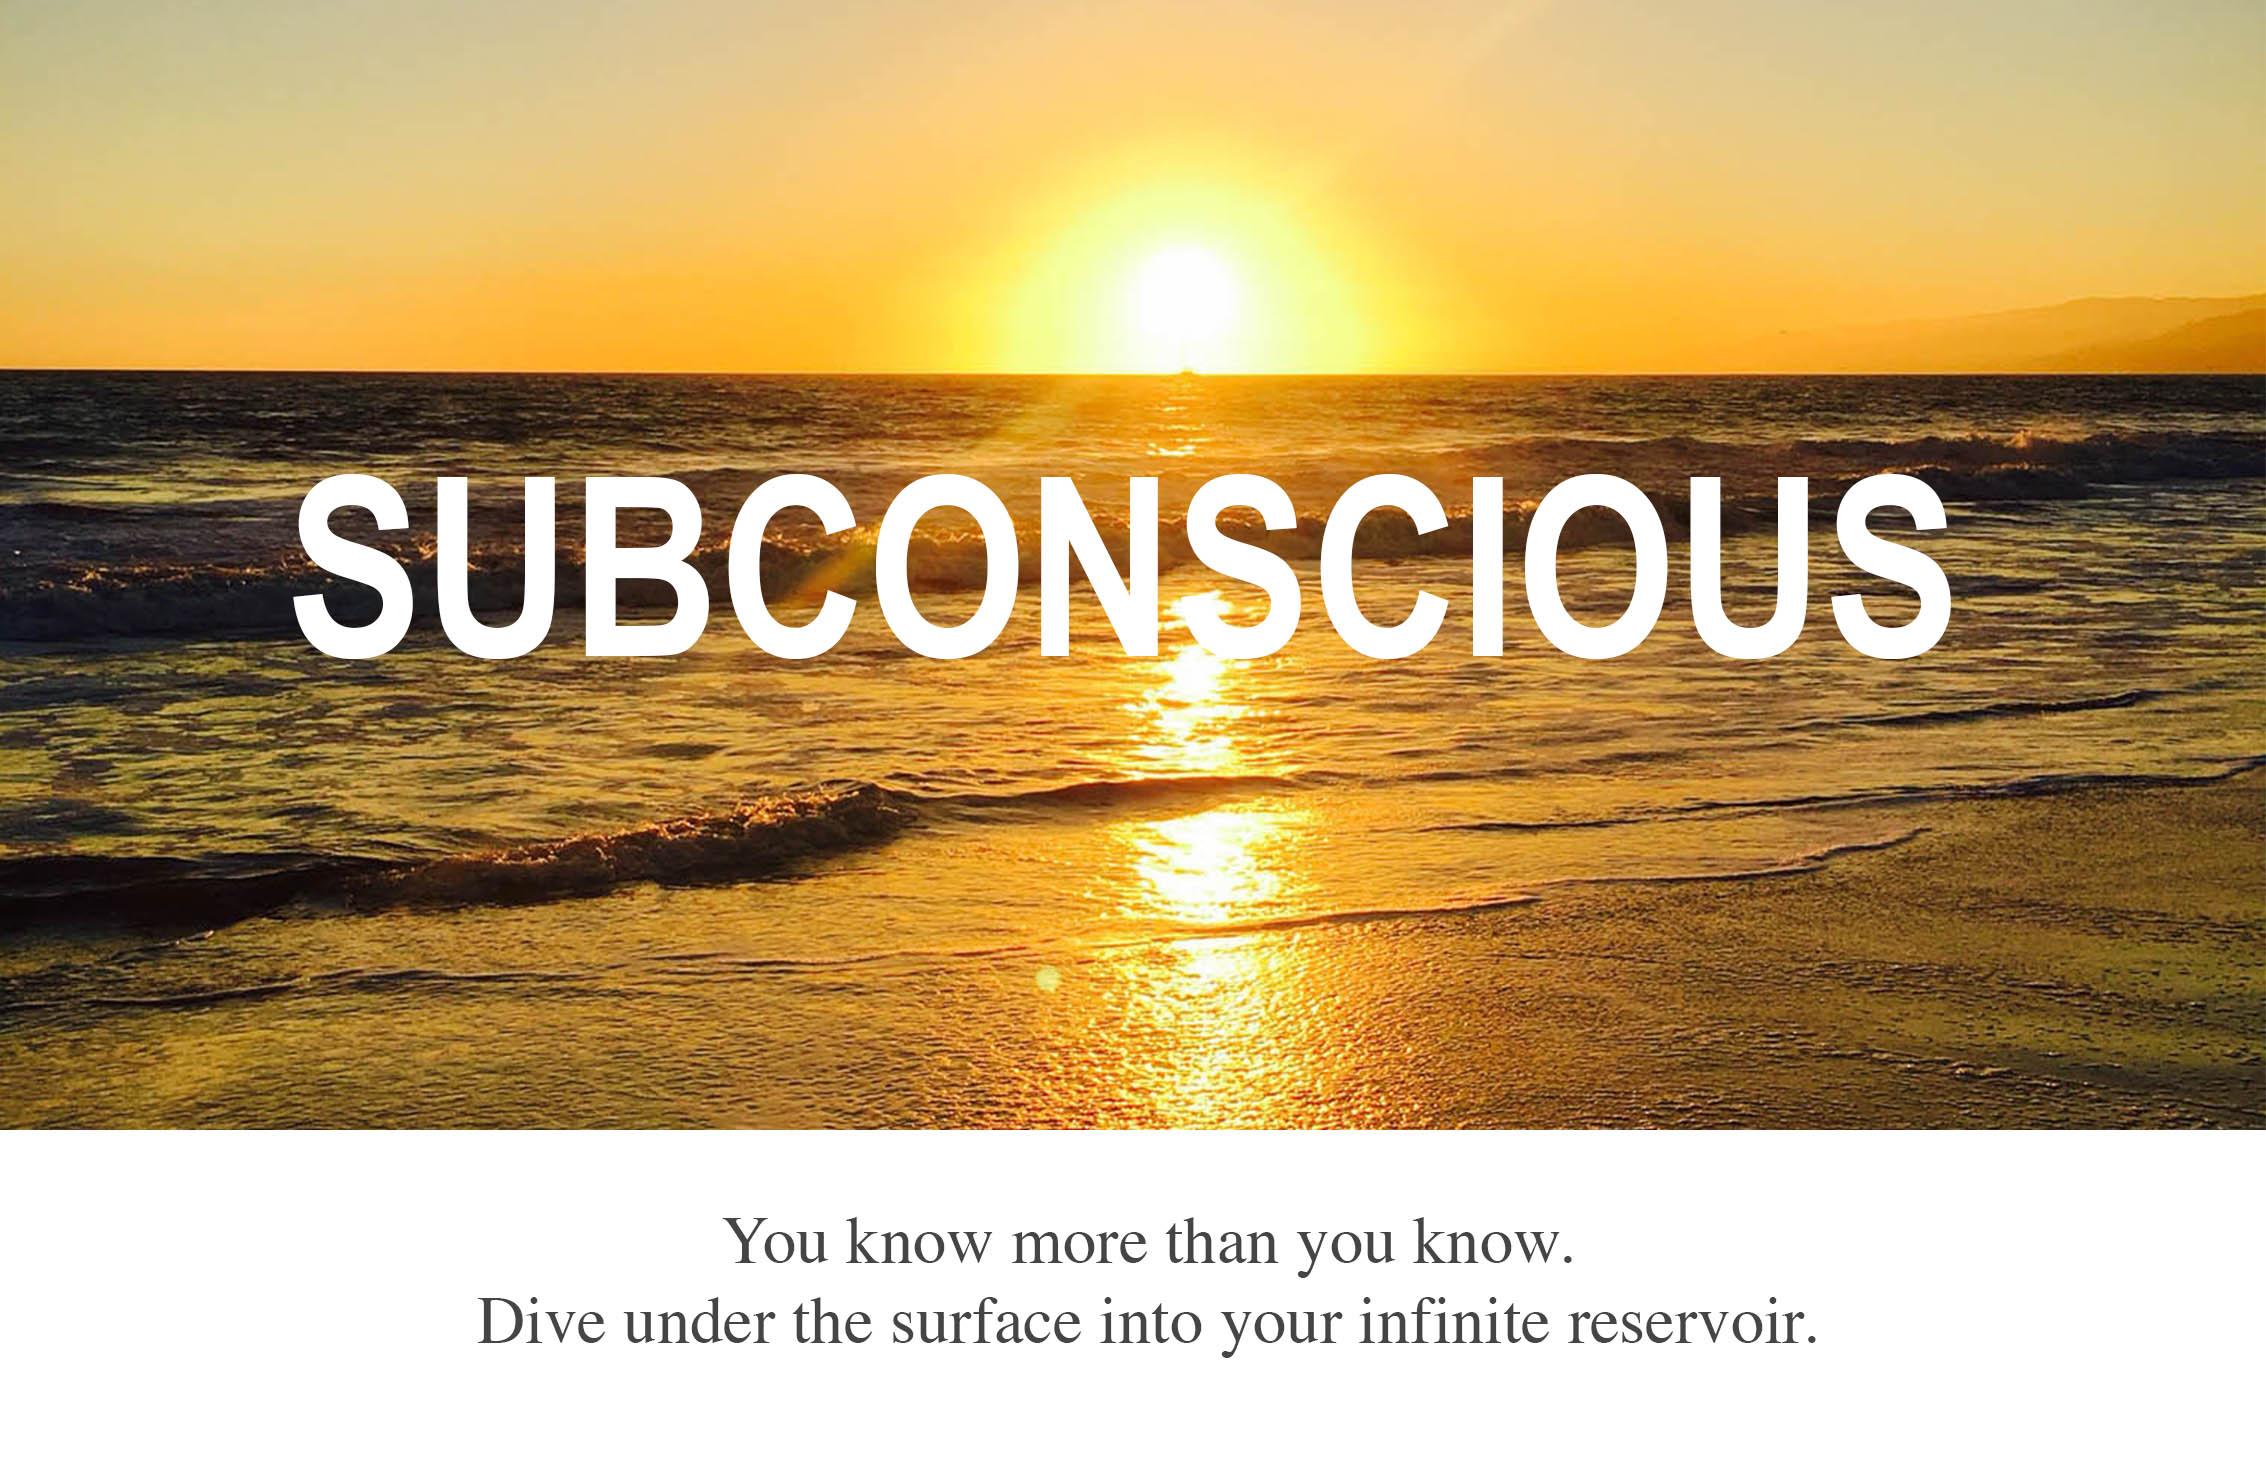 subconscious_crop.jpg